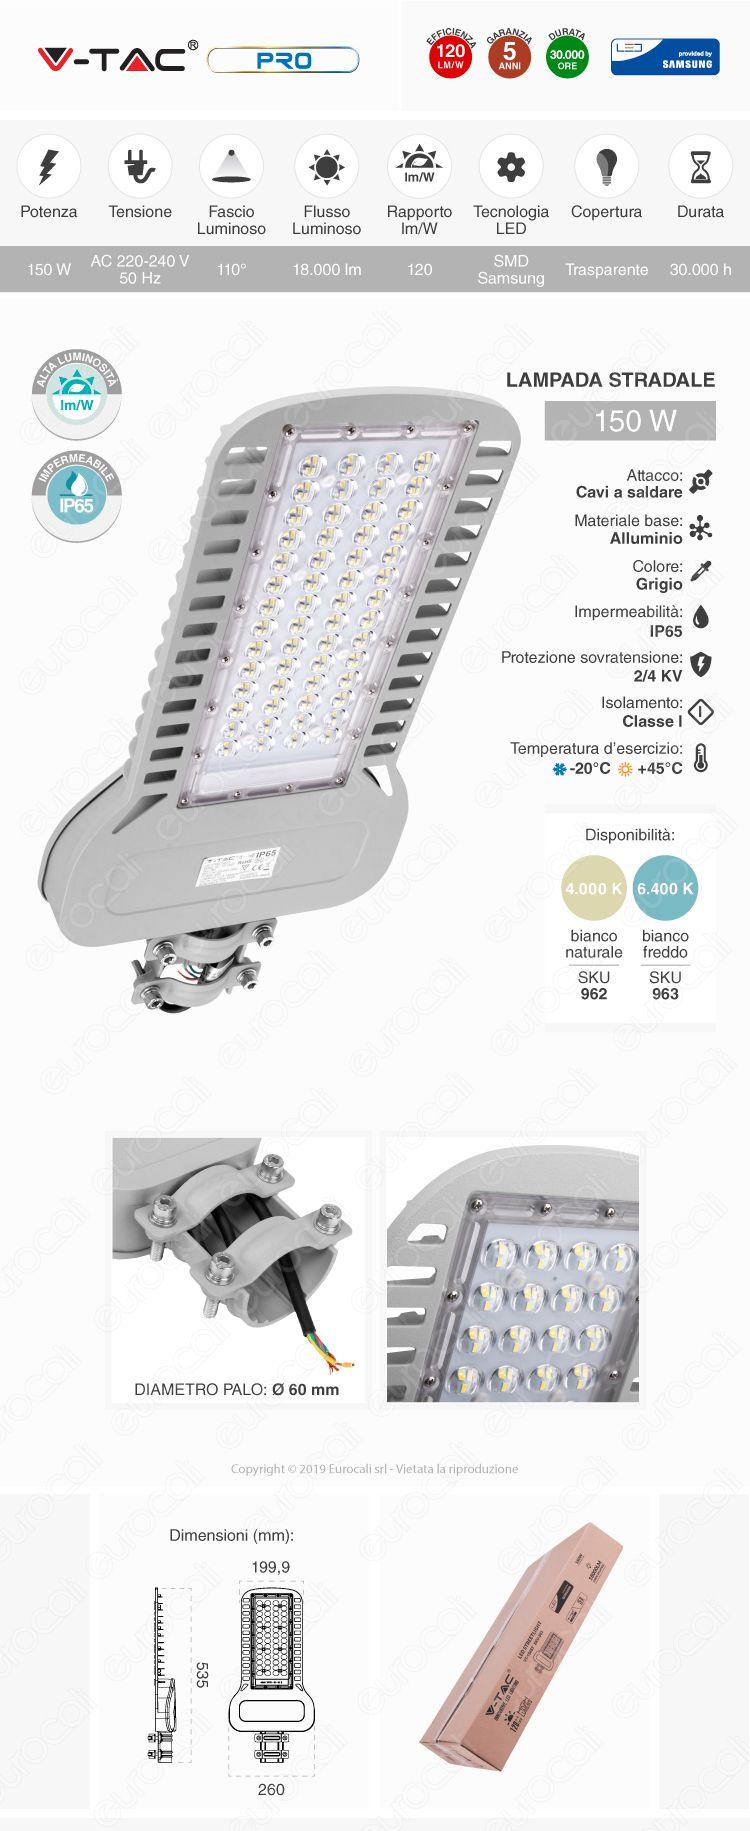 V-Tac PRO VT-154ST Lampada Stradale LED 150W Lampione SMD Chip Samsung